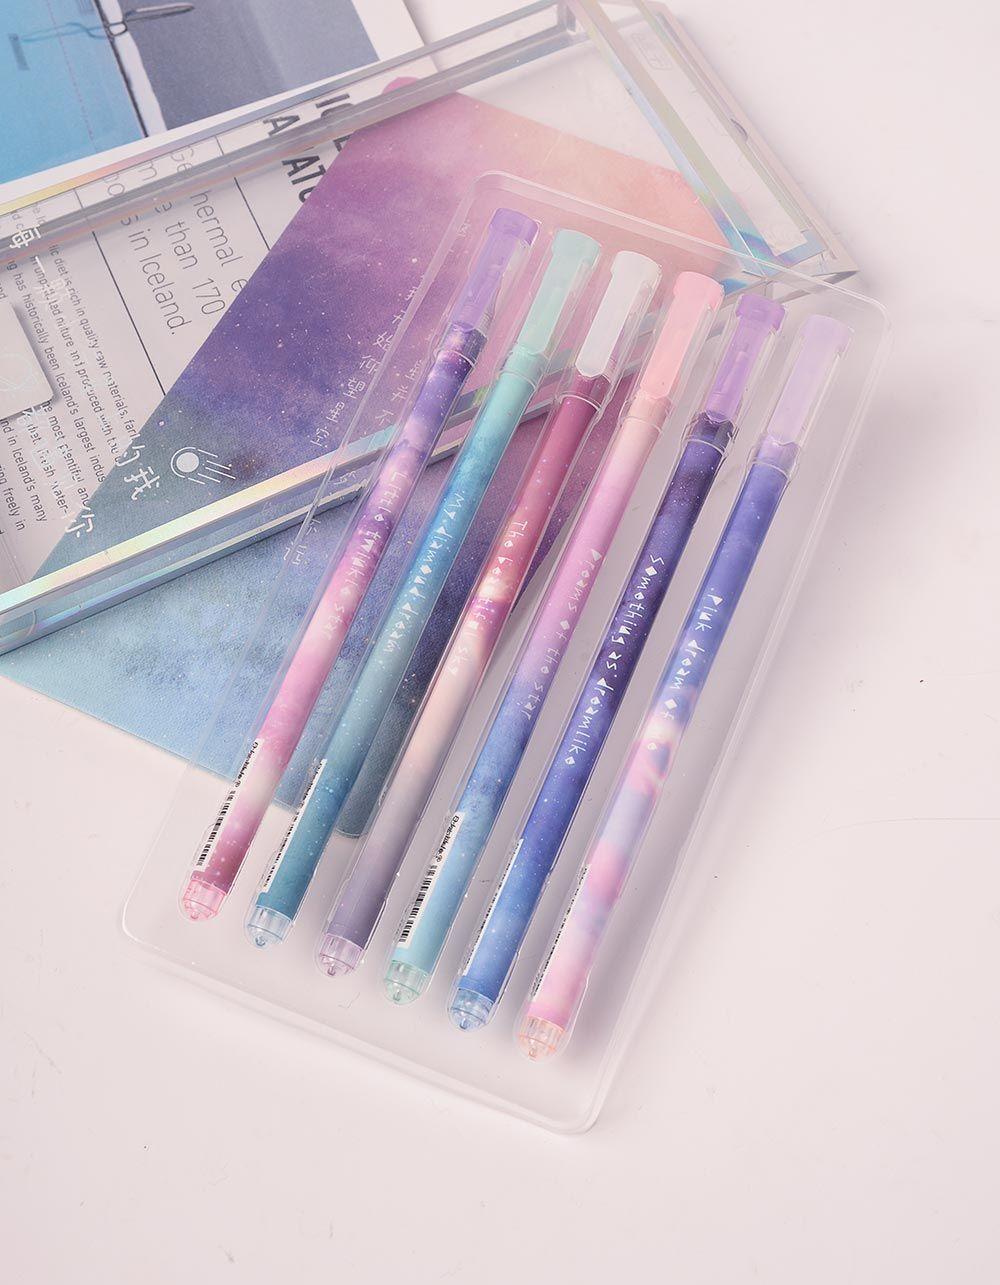 Ручки у наборі з принтом космосу | 238750-21-XX